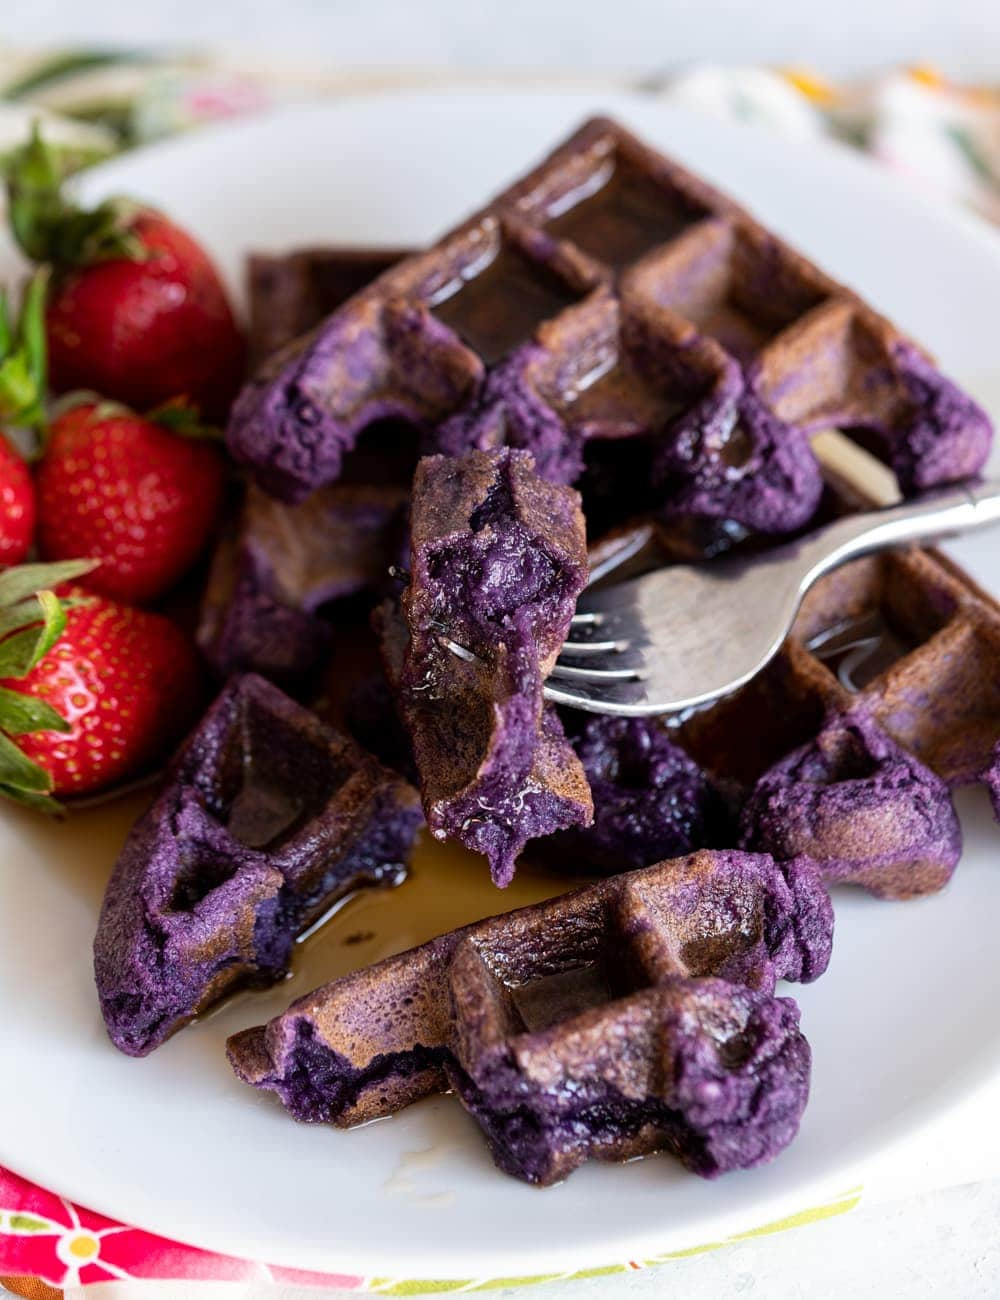 Ube Mochi Waffles (Purple Sweet Potato Mochi Waffles) www.pineappleandcoconut.com